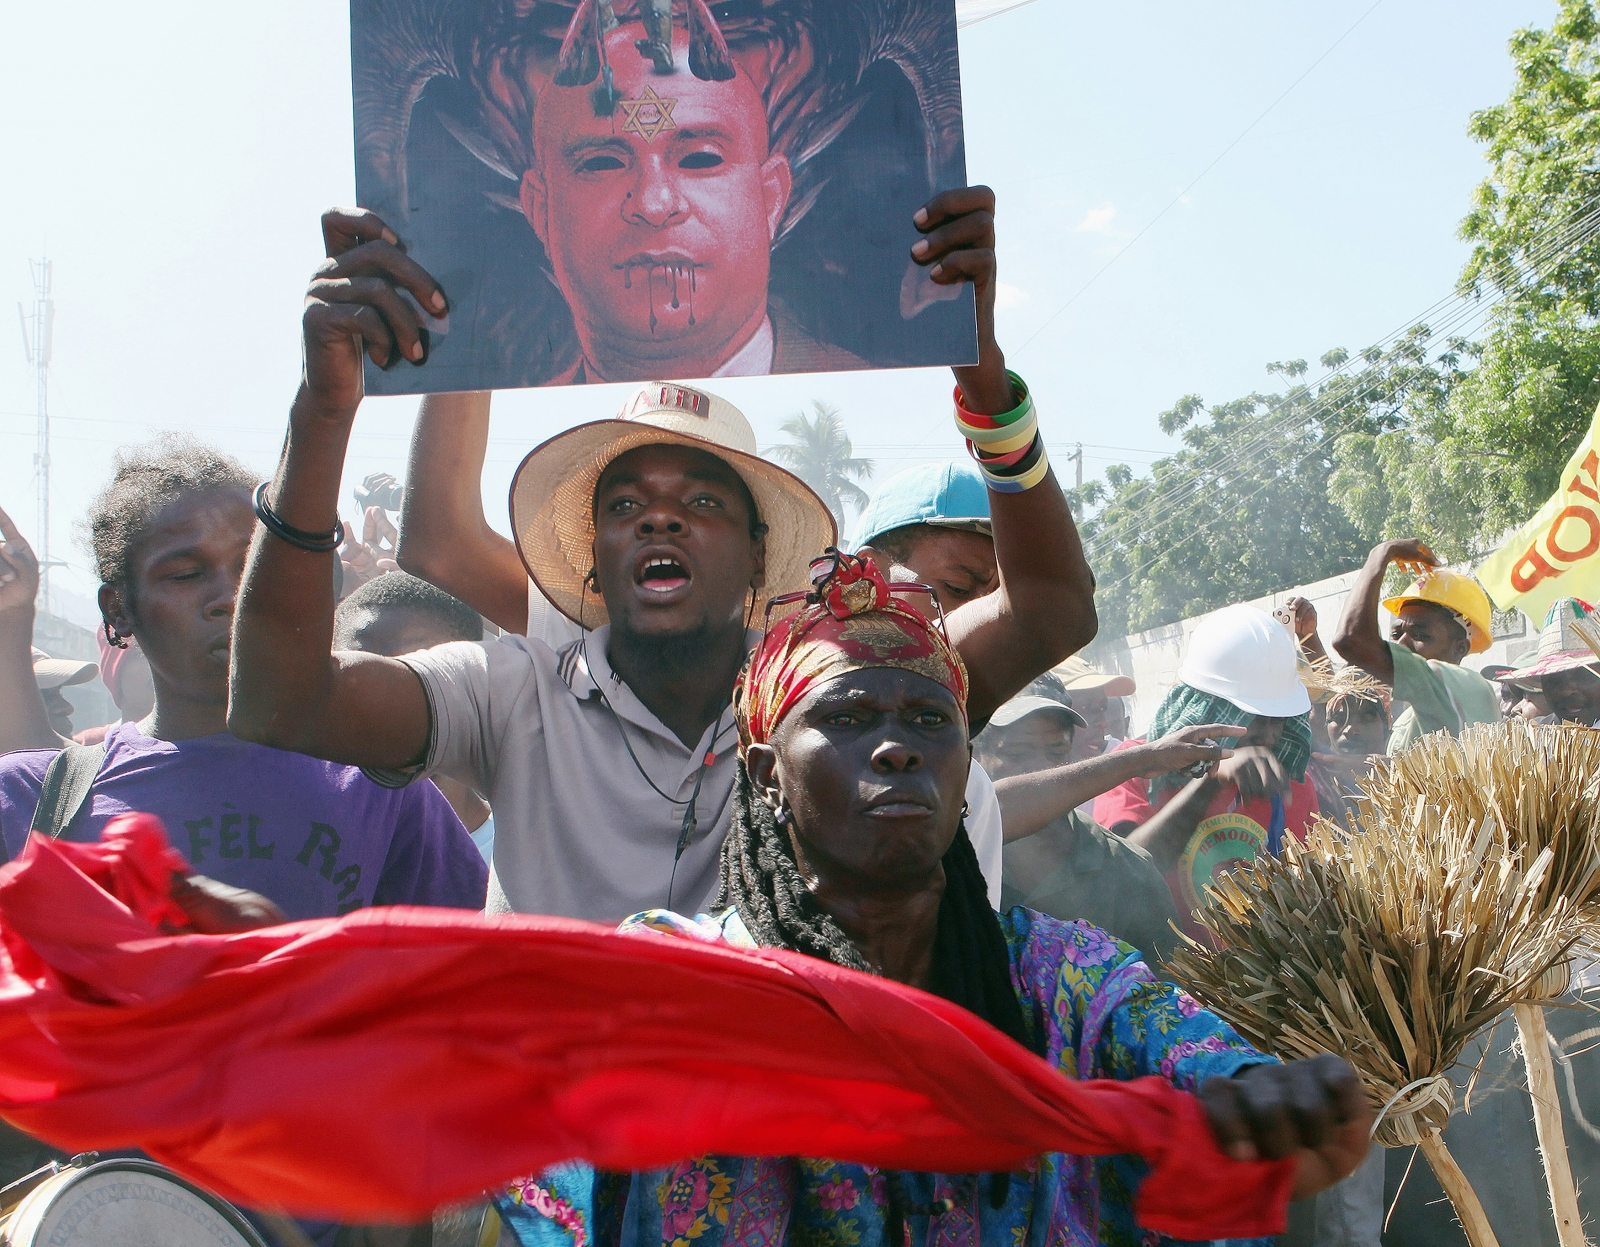 Protesters in Haiti